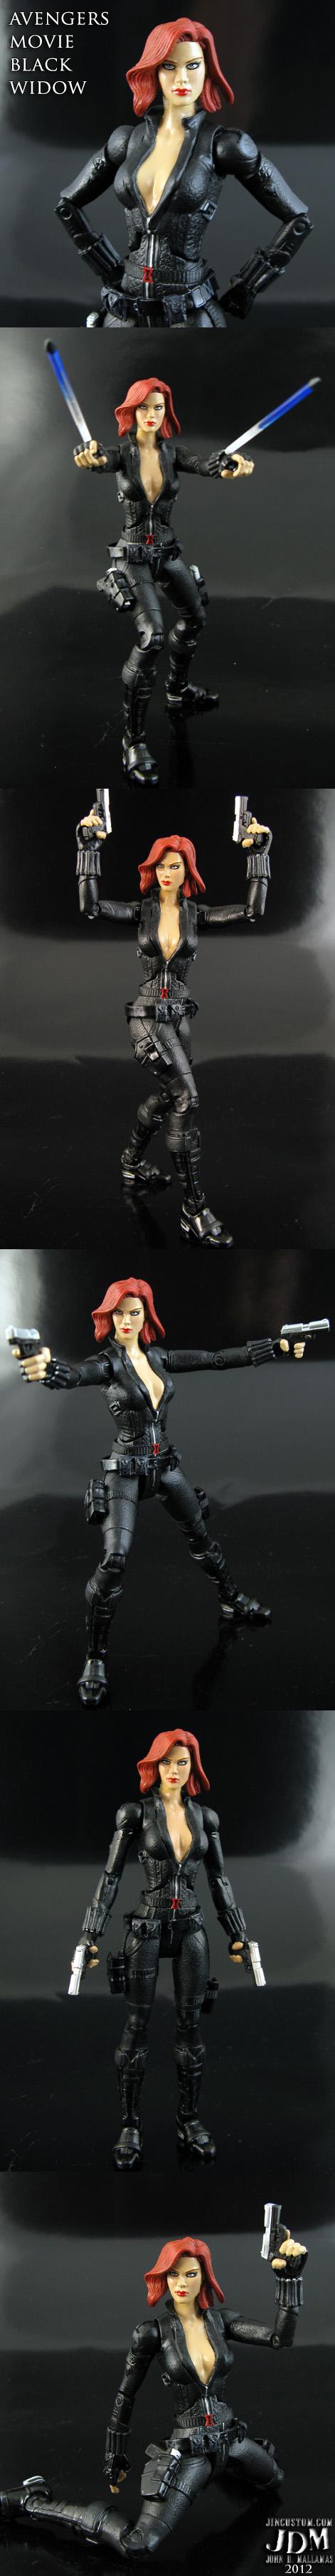 Avengers Black Widow Figure